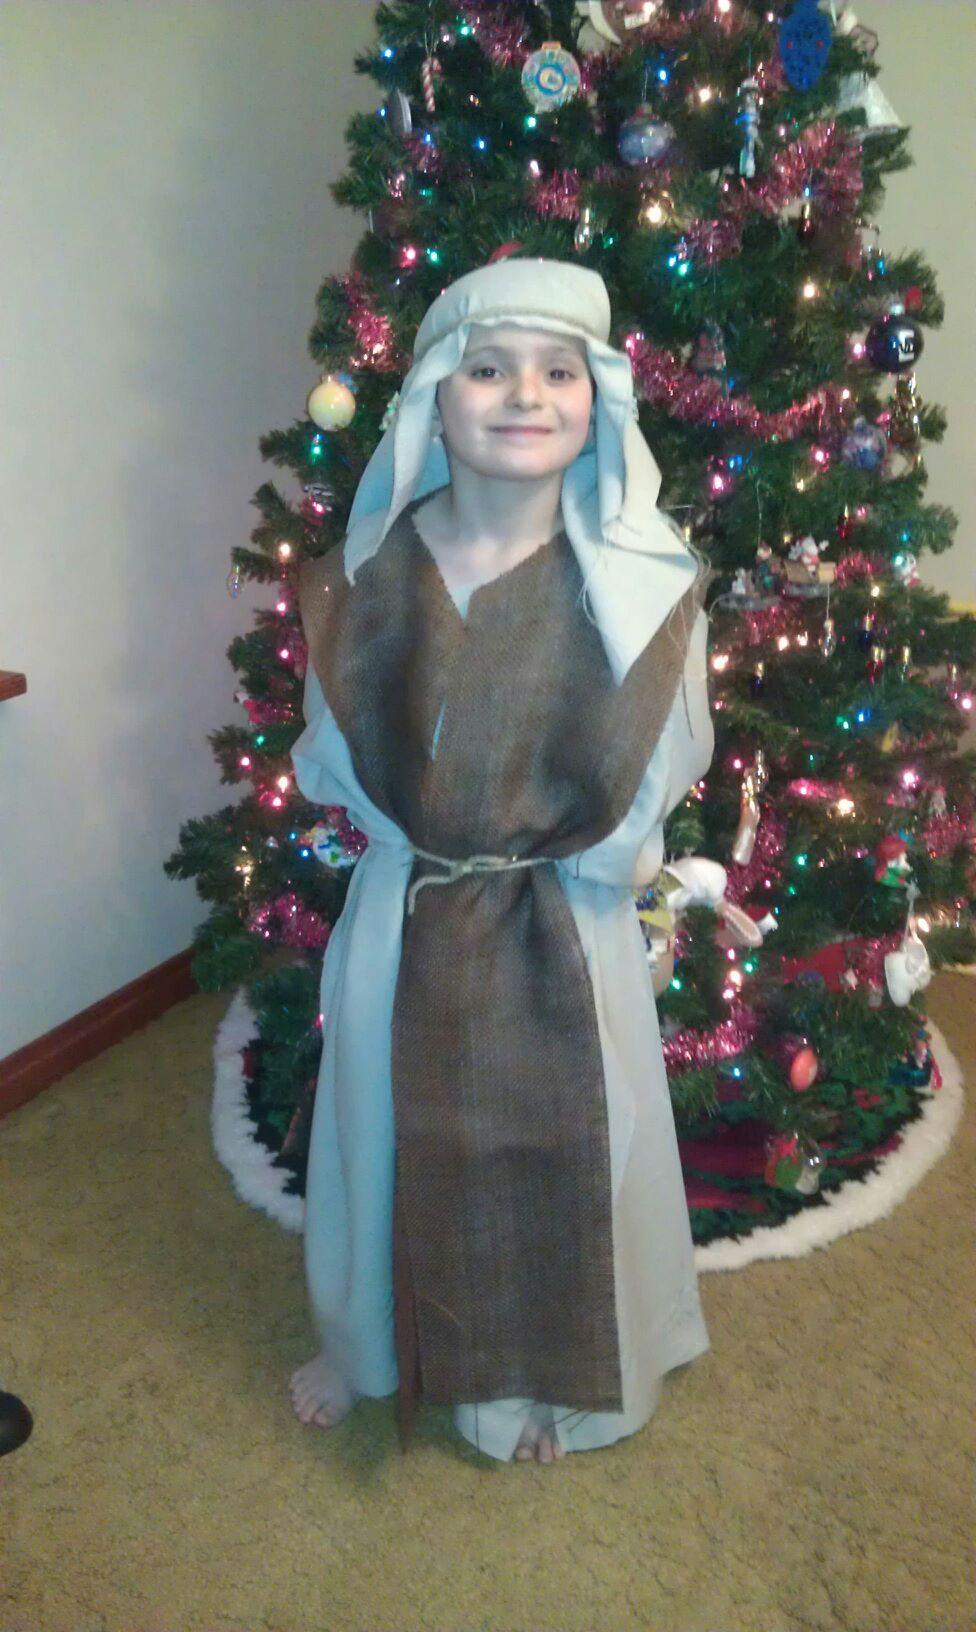 Shepherd S Costume For Church No Sewing Involved Shepherd Costume Christmas Dress Up Nativity Costumes